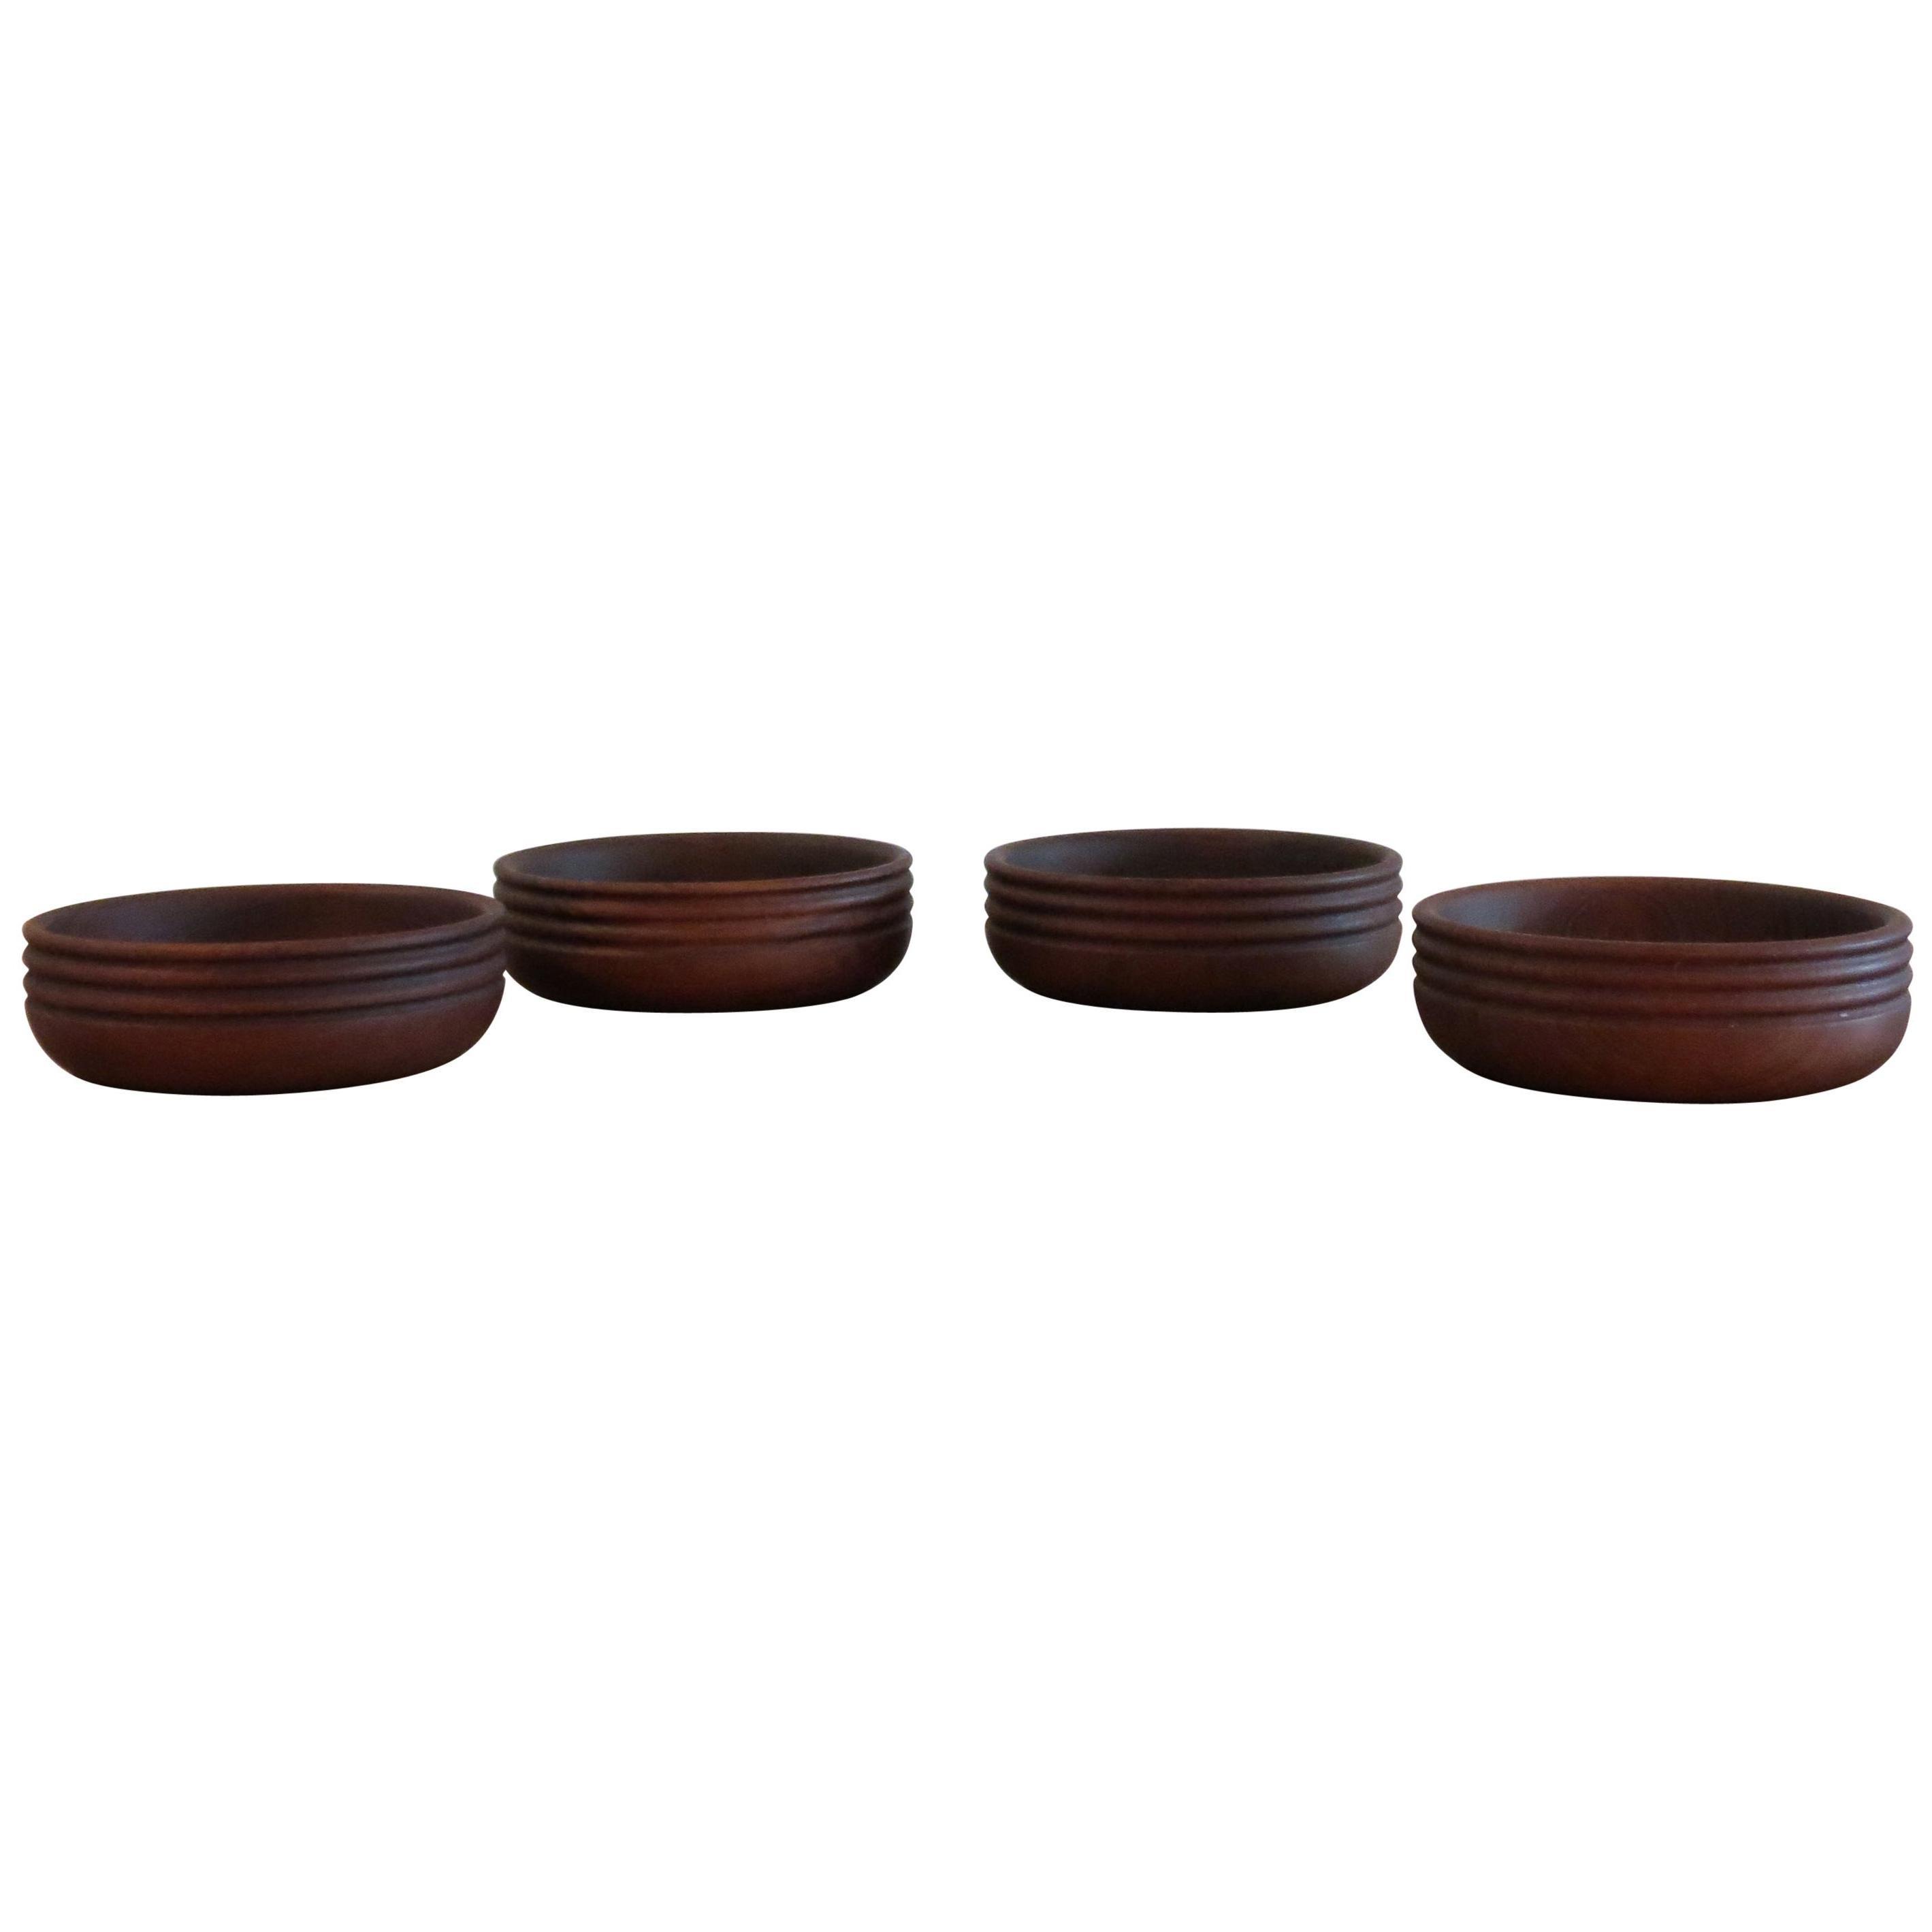 Set of 4 Vintage Handmade Teak Wooden Bowls by Galatix